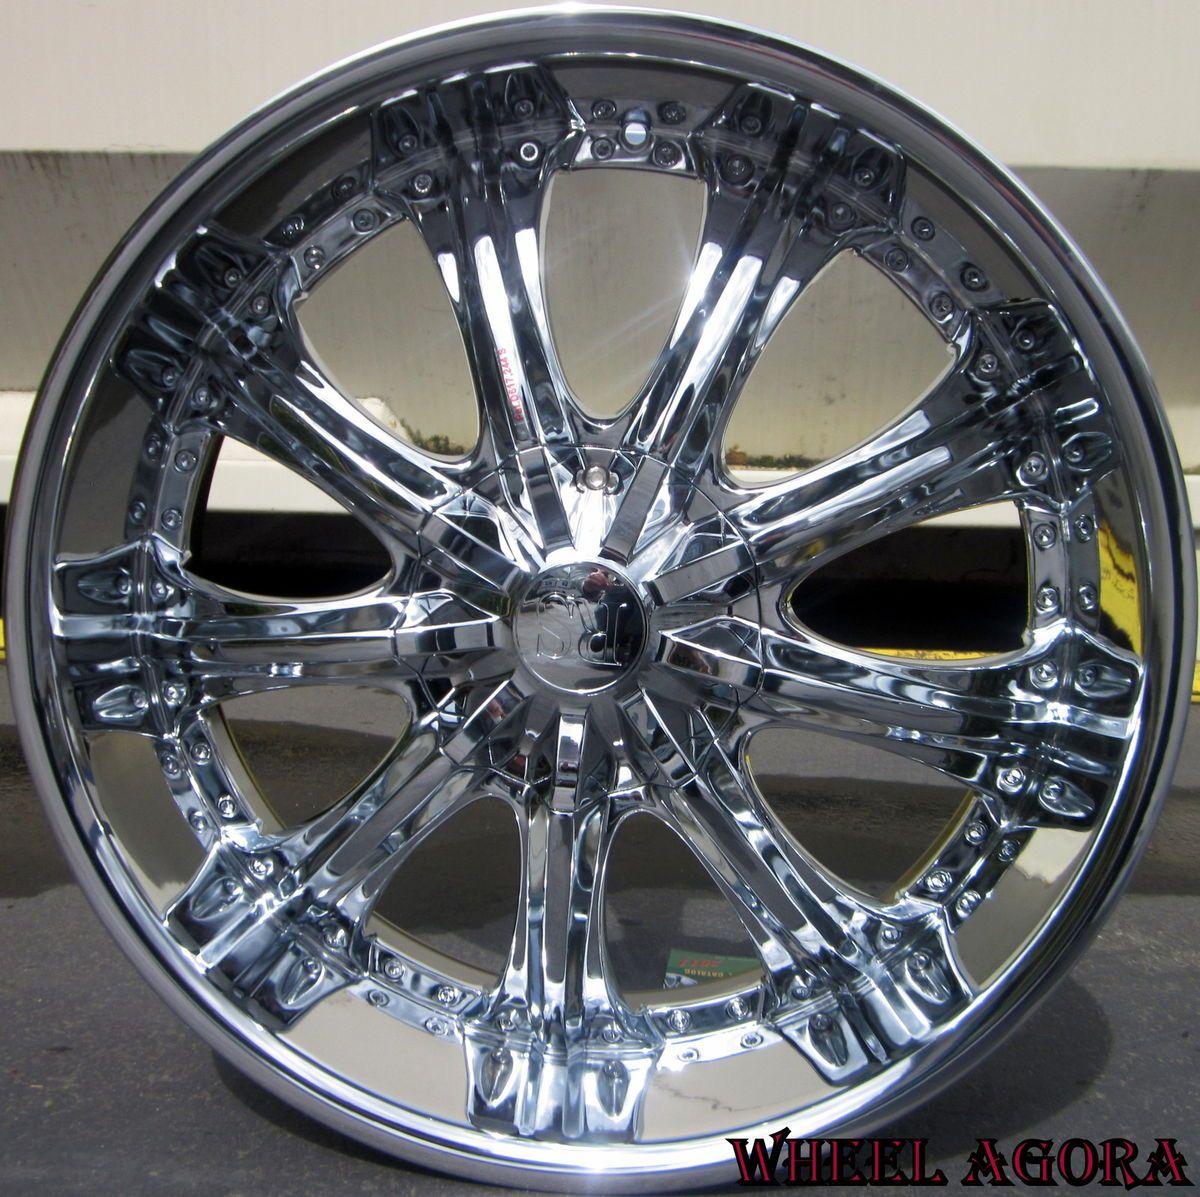 26 inch Wheels Rims Tires RSW33 Escalade Tahoe Suburban Denali Yukon